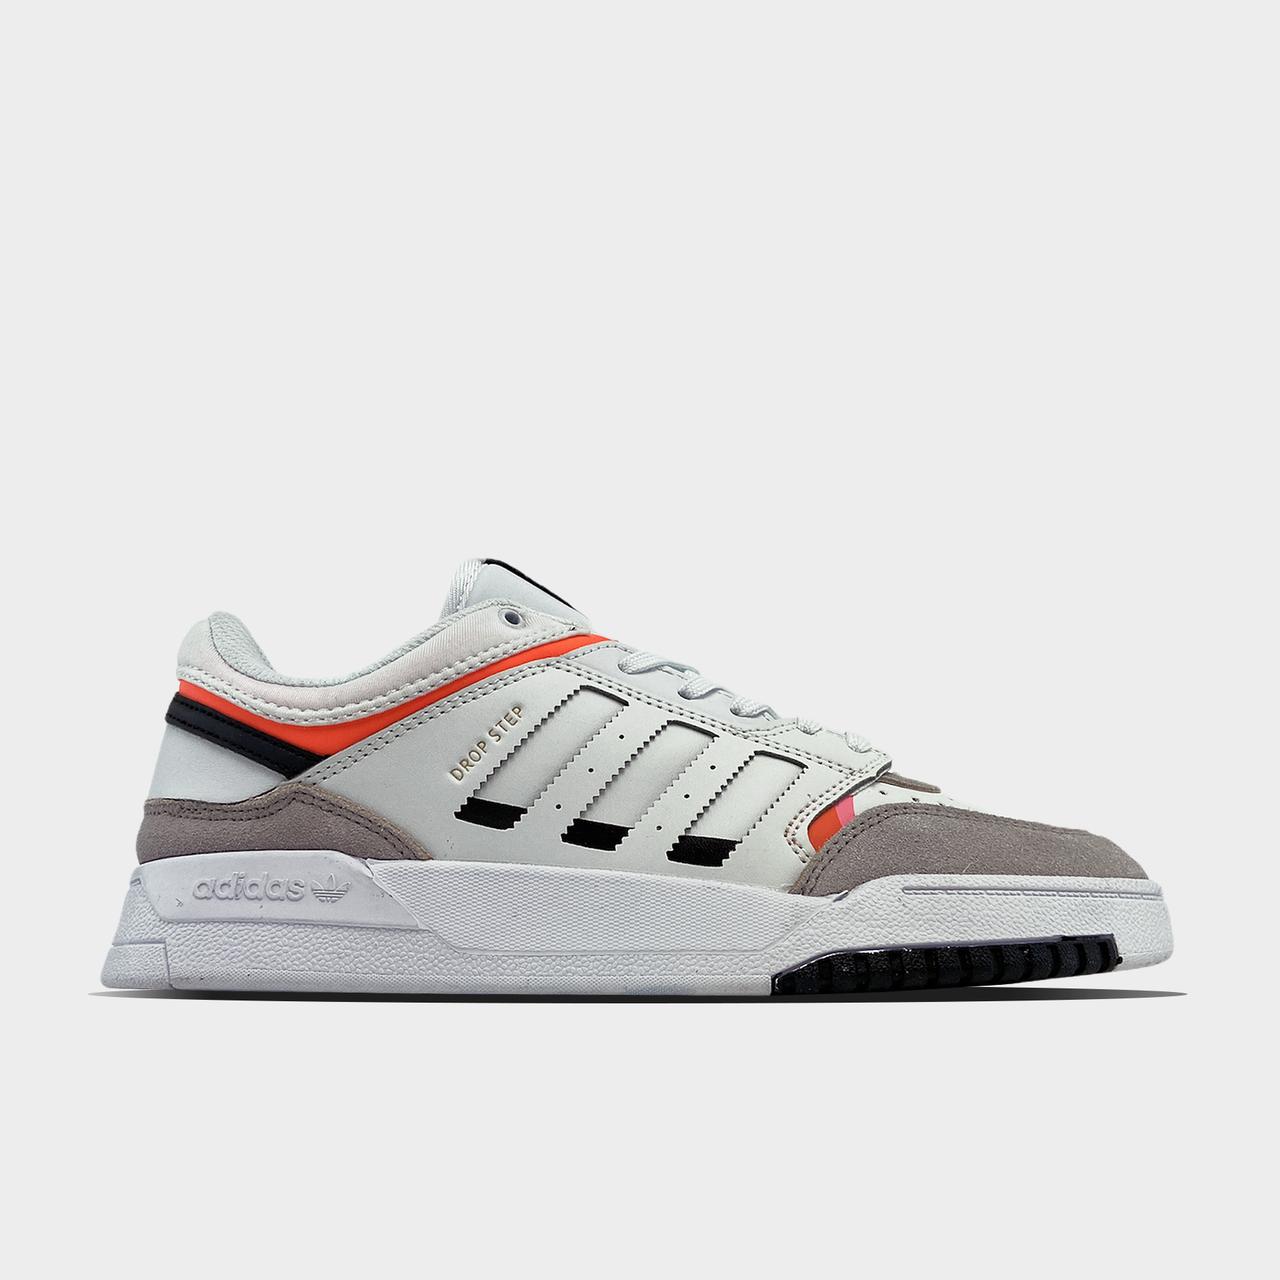 Adidas Drop Step White (Білий)